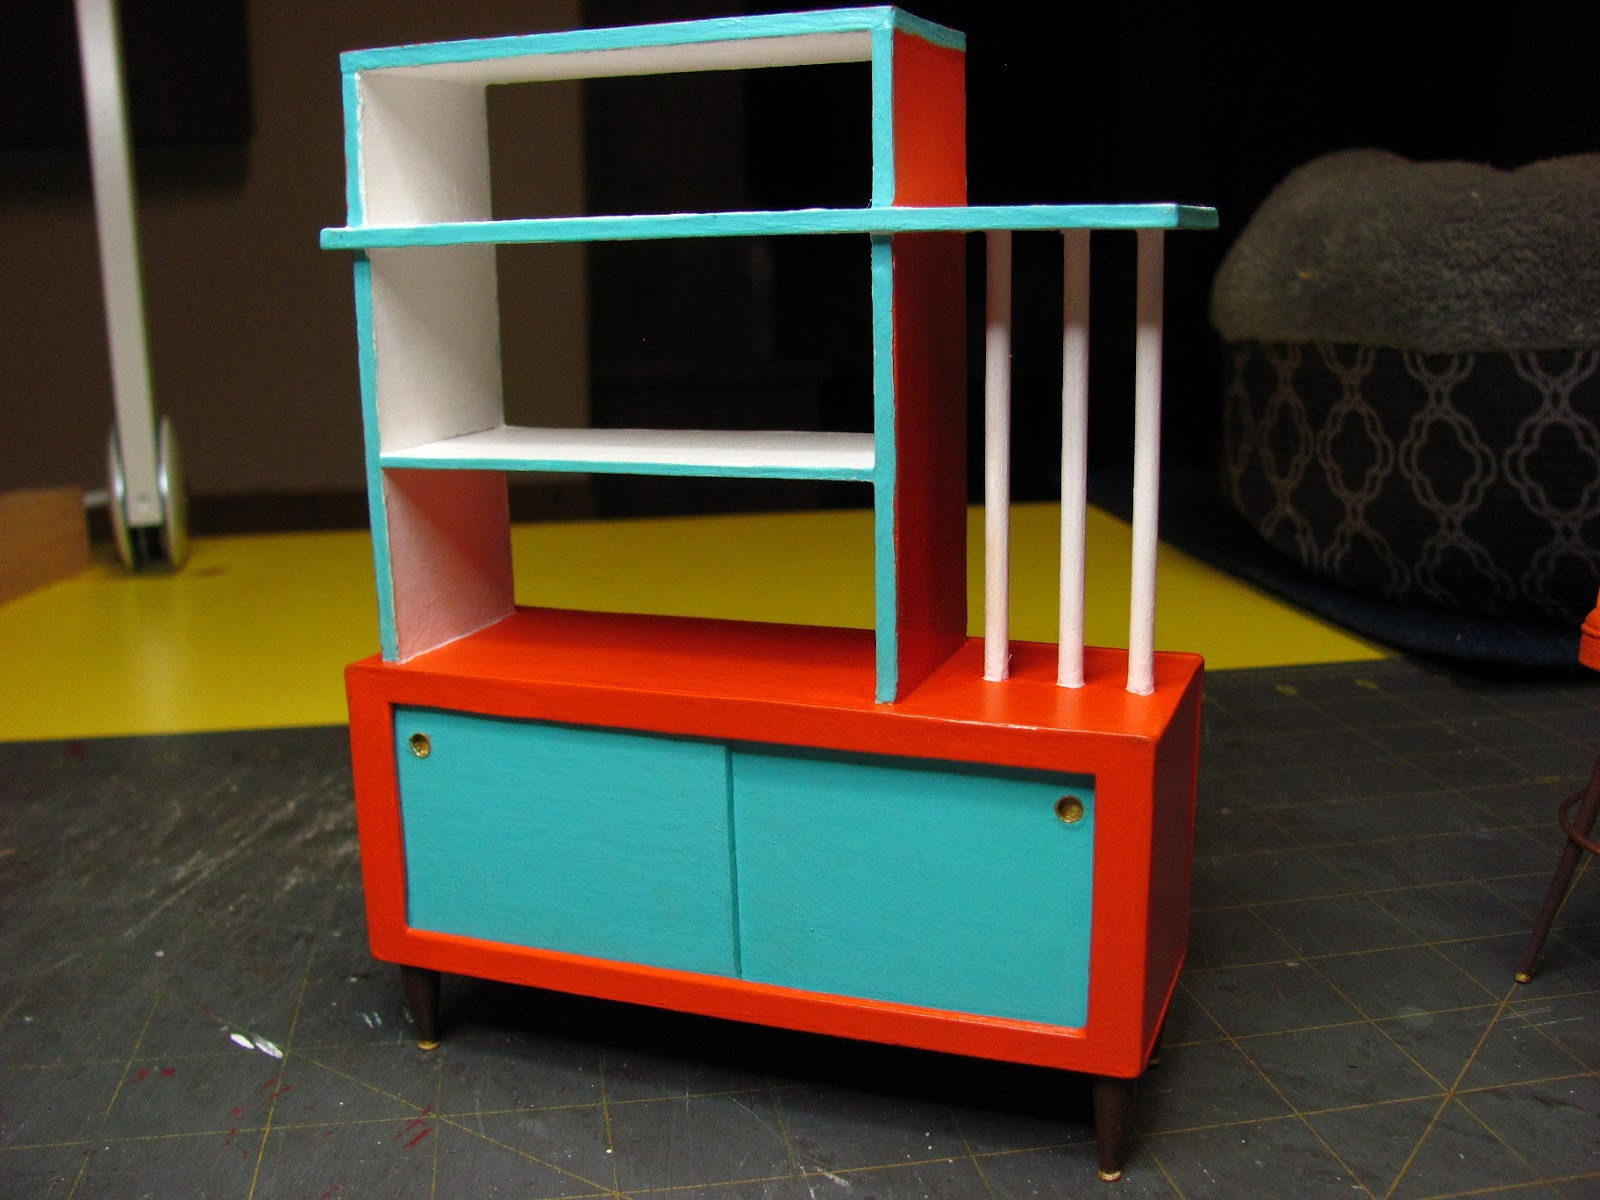 miniature furniture cardboardwood routers. Miniature Furniture Tutorials. Mid-century 1 Inch Scale Room Divider/bookshelf Tutorial - Cardboardwood Routers R